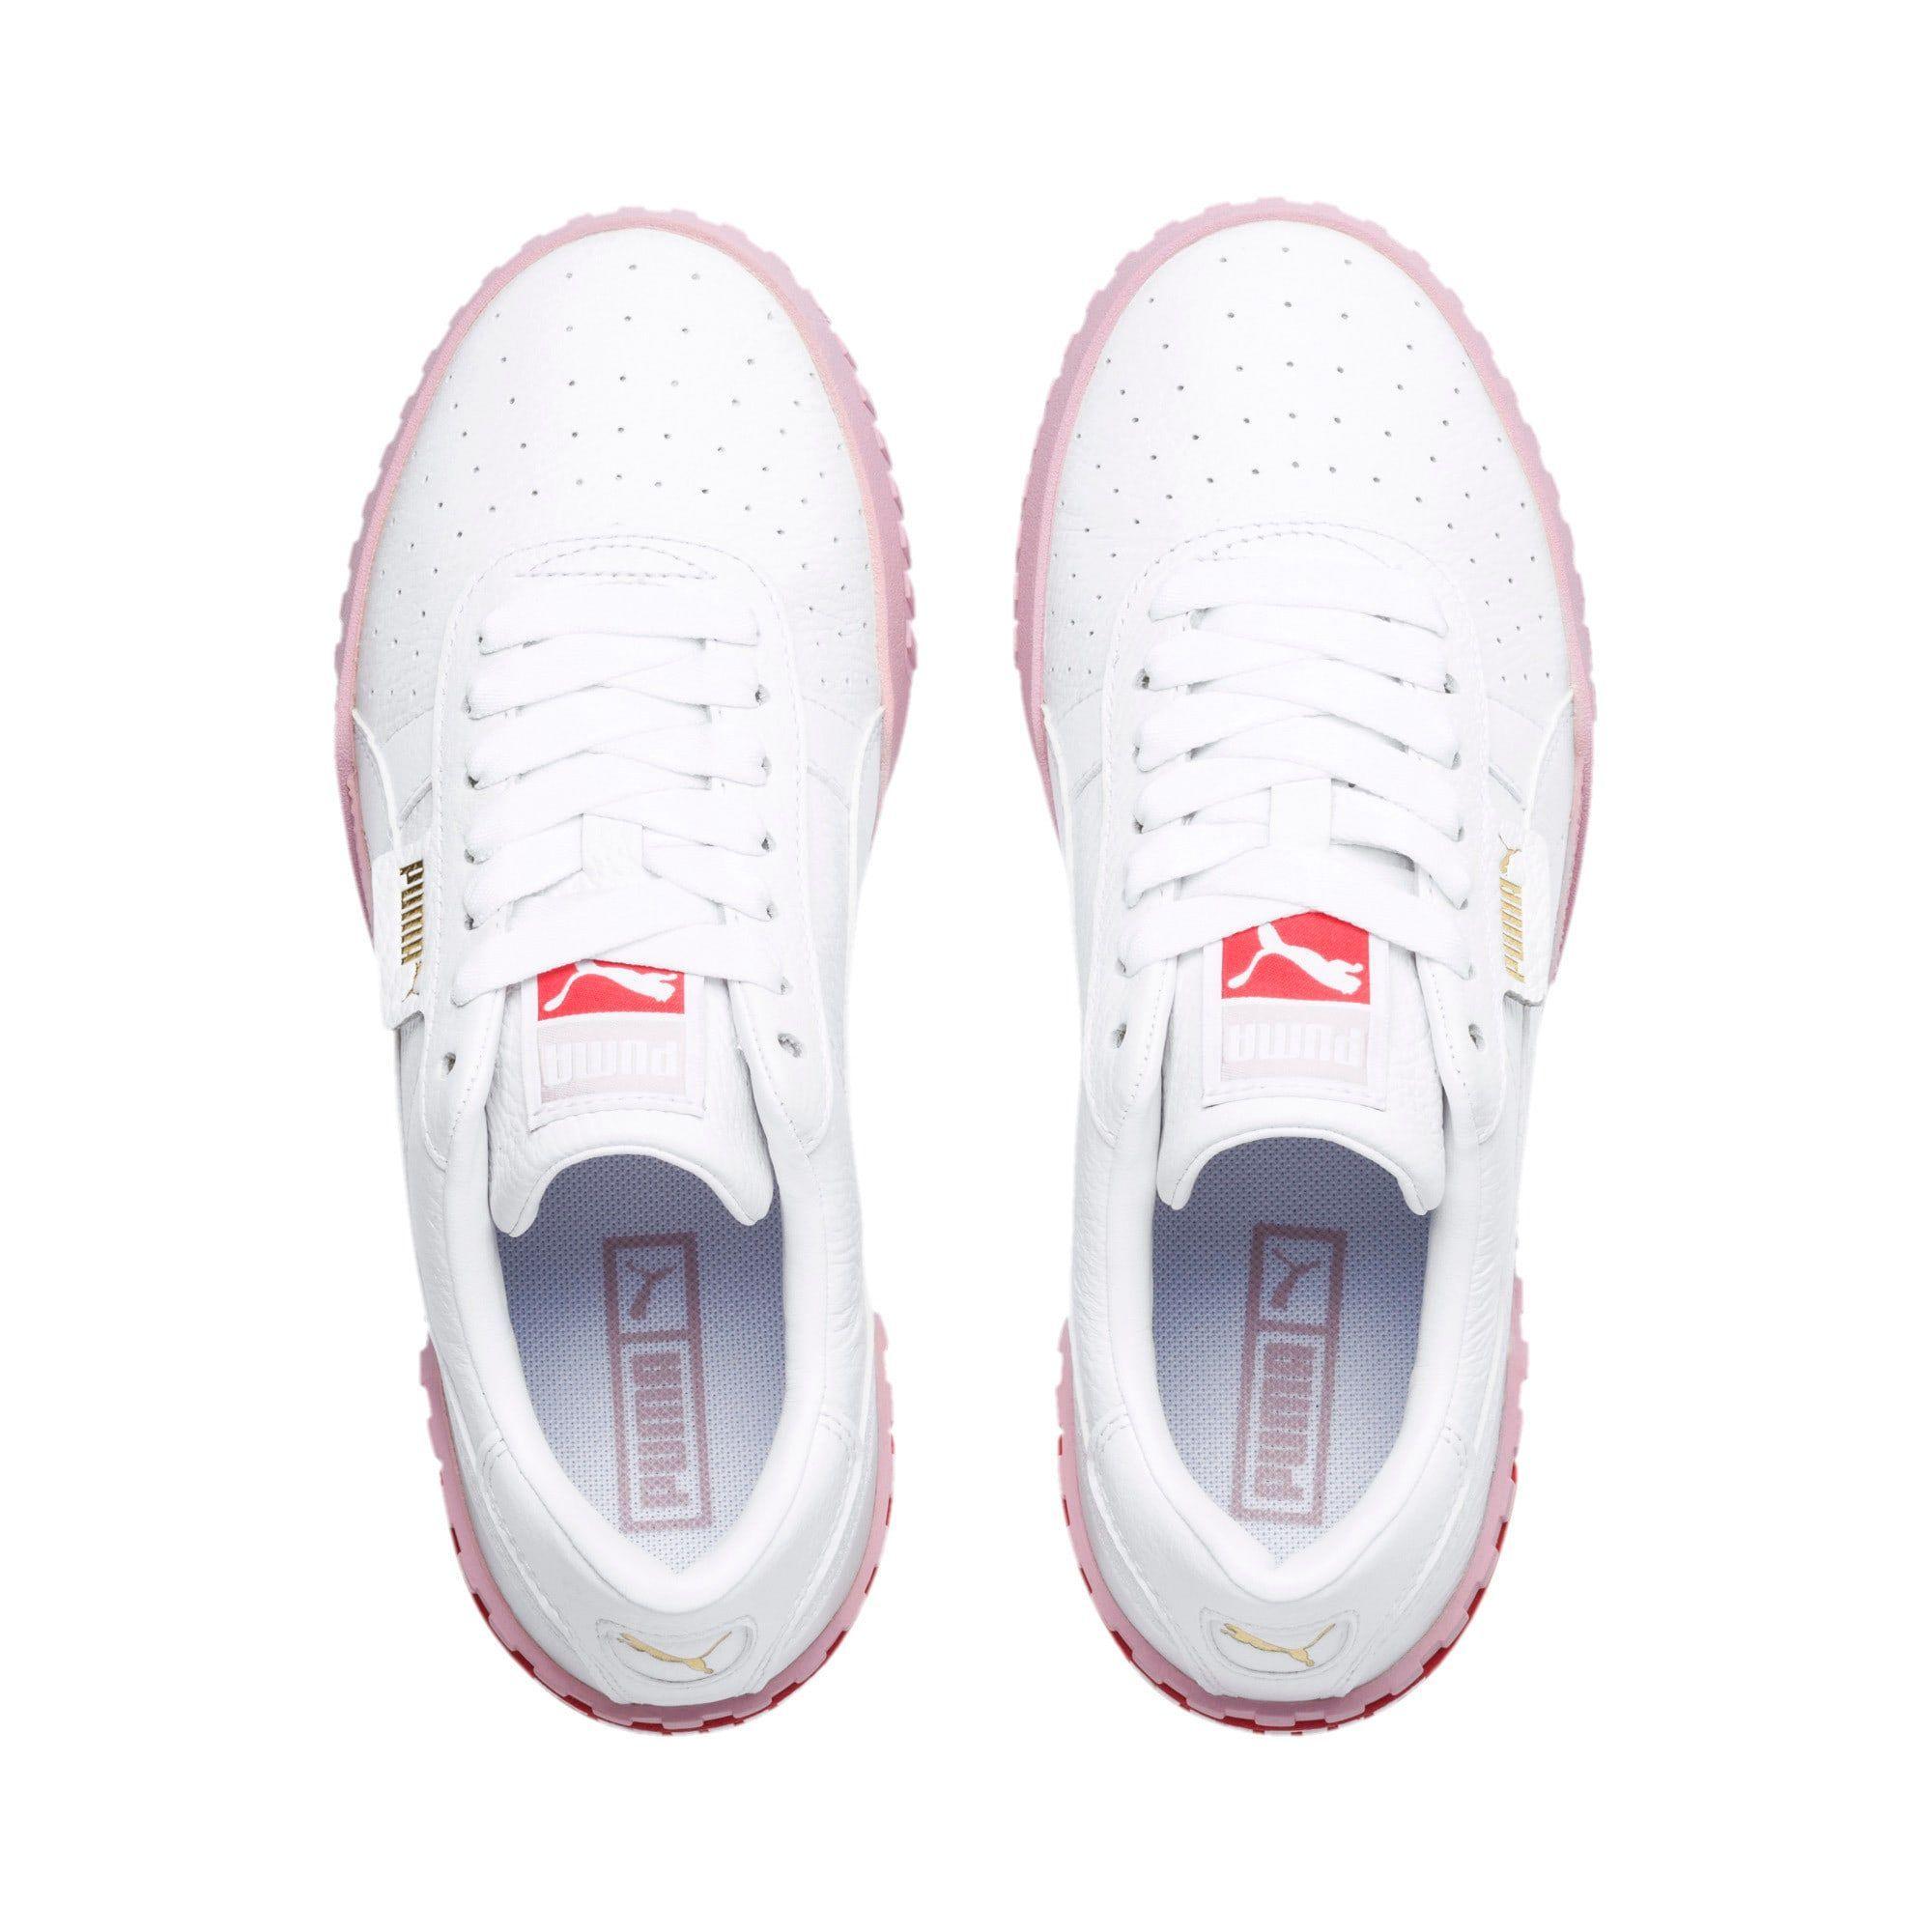 Shoes#cali #pink #puma #shoes